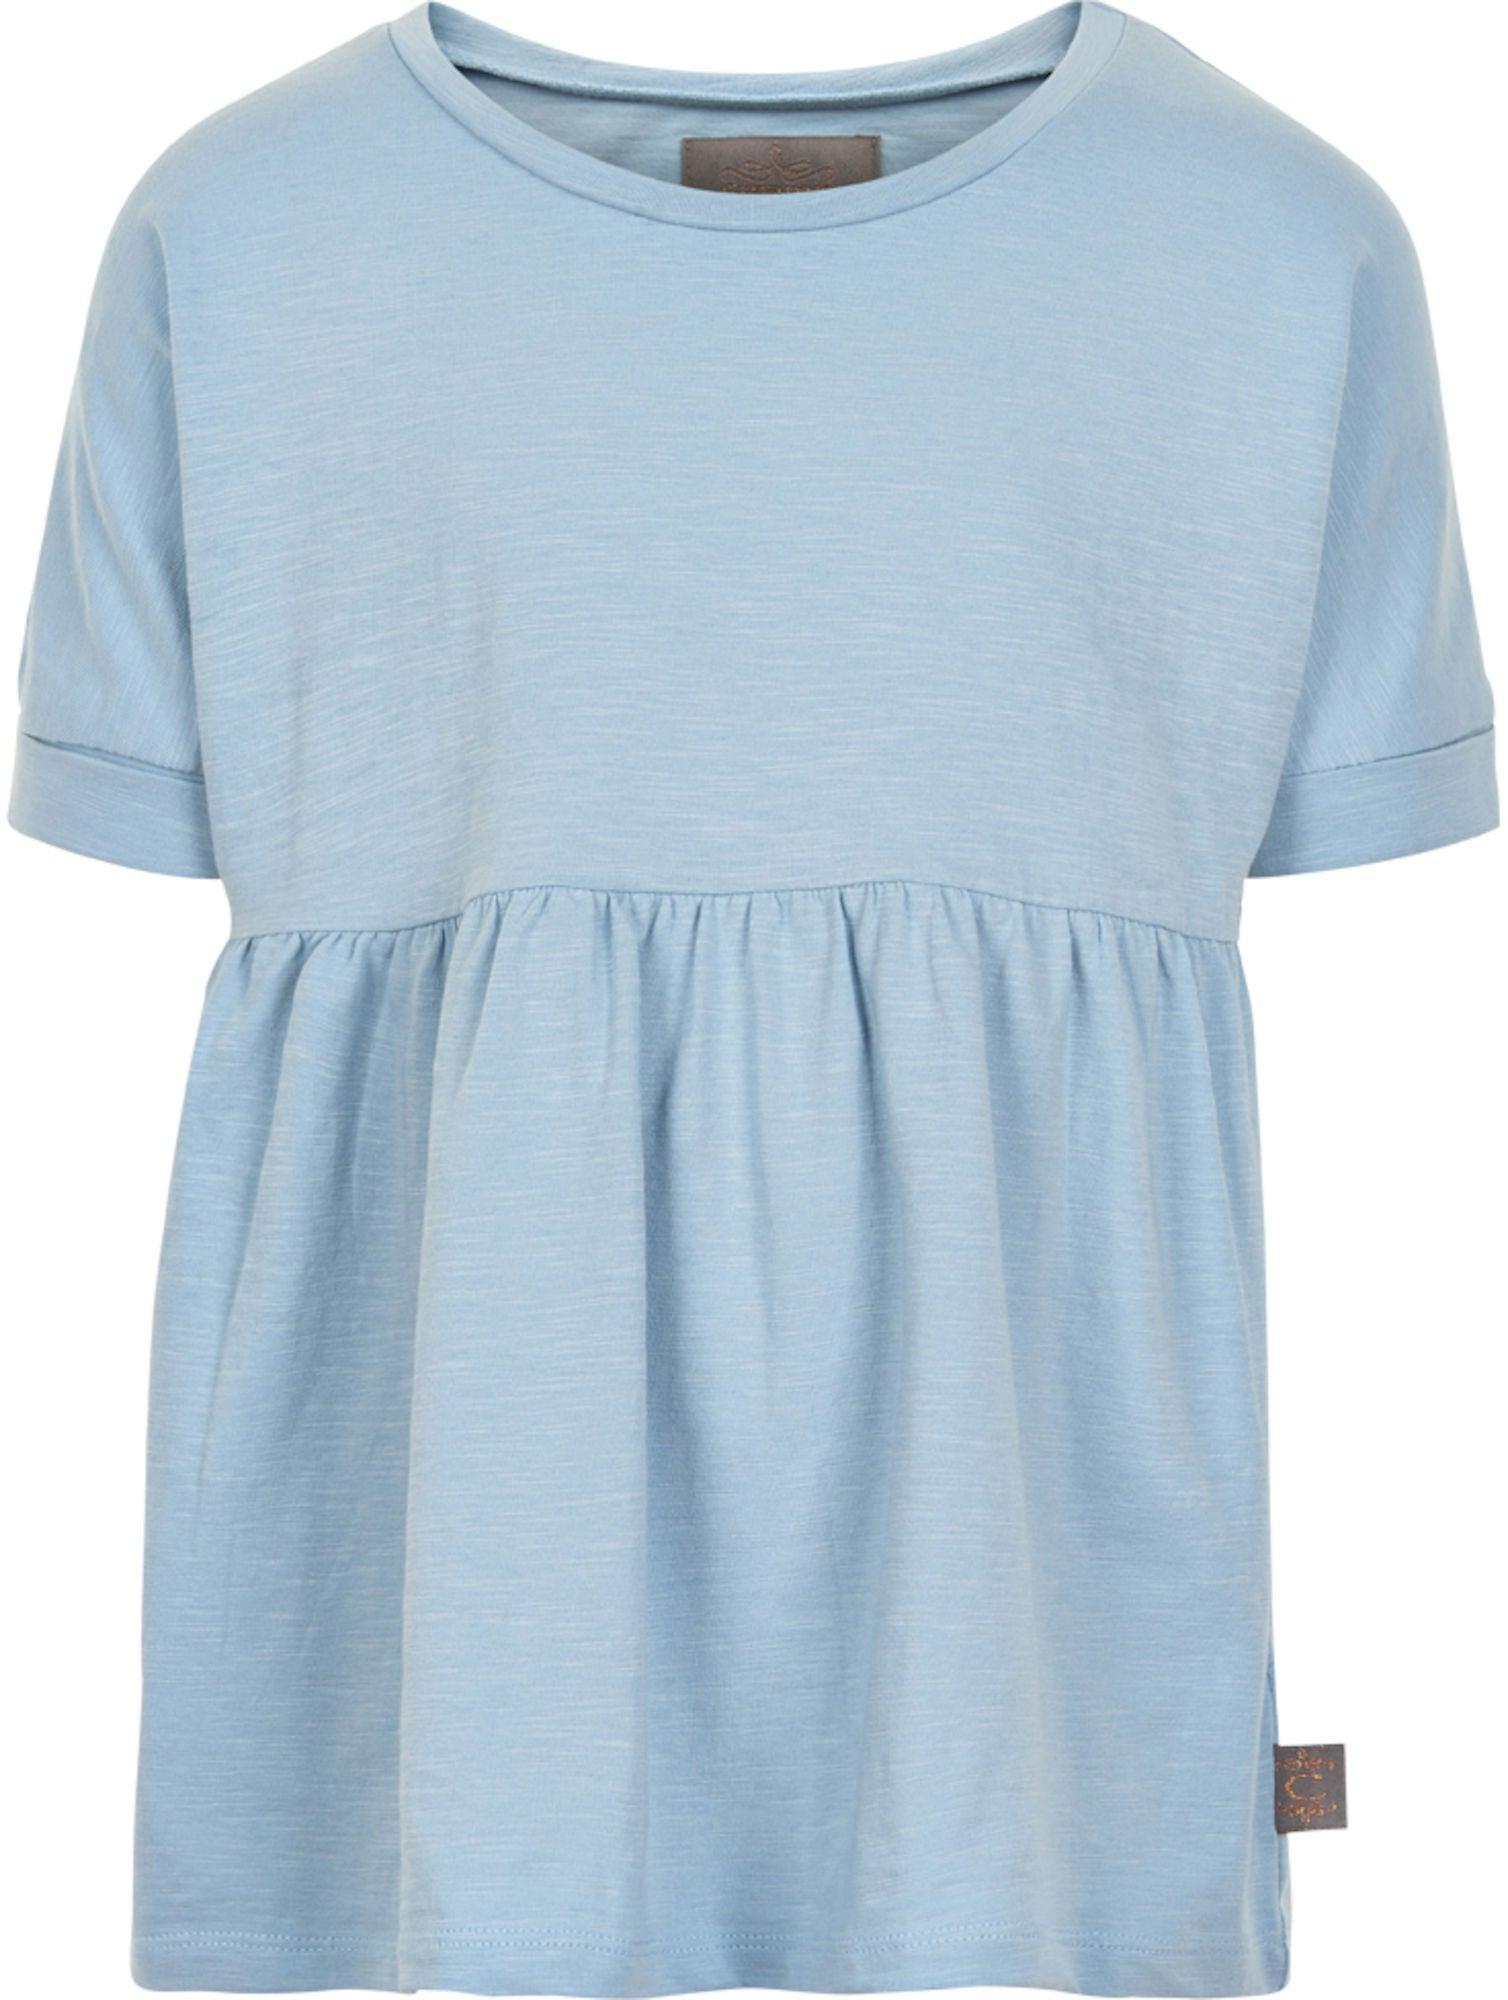 Creamie Slub Jersey T-Shirt, Blue Fog 128